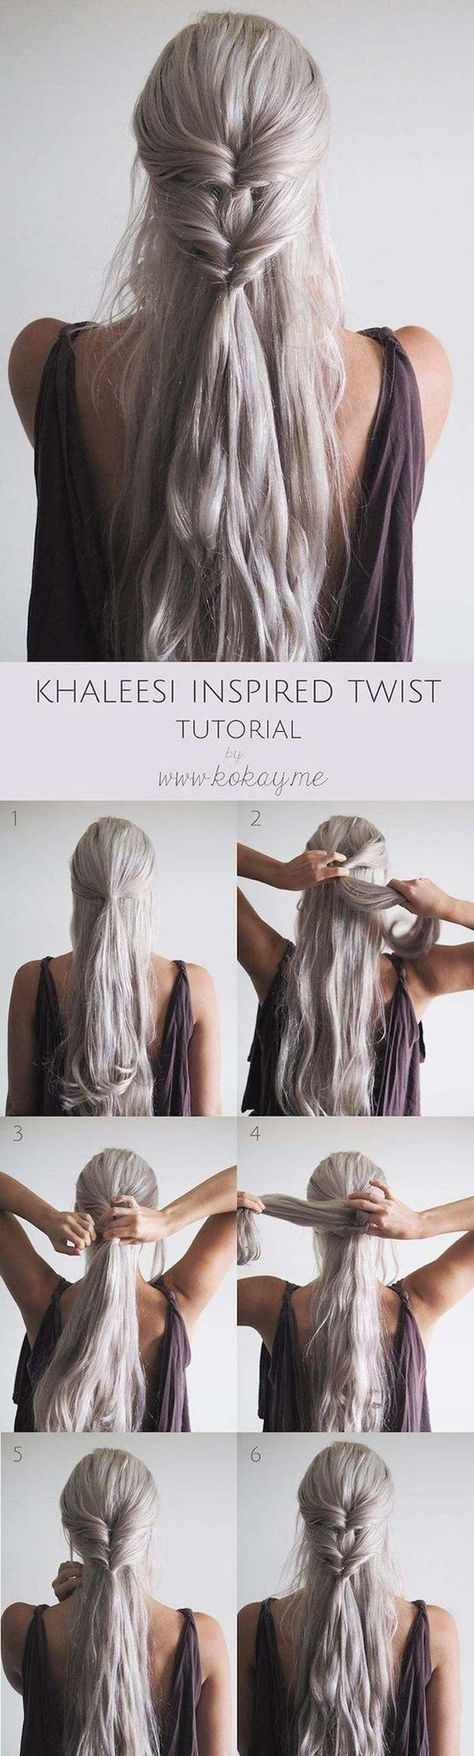 Best Hairstyles for Long Hair - Khaleesi Inspired Twist - Step by Step Tutorials...